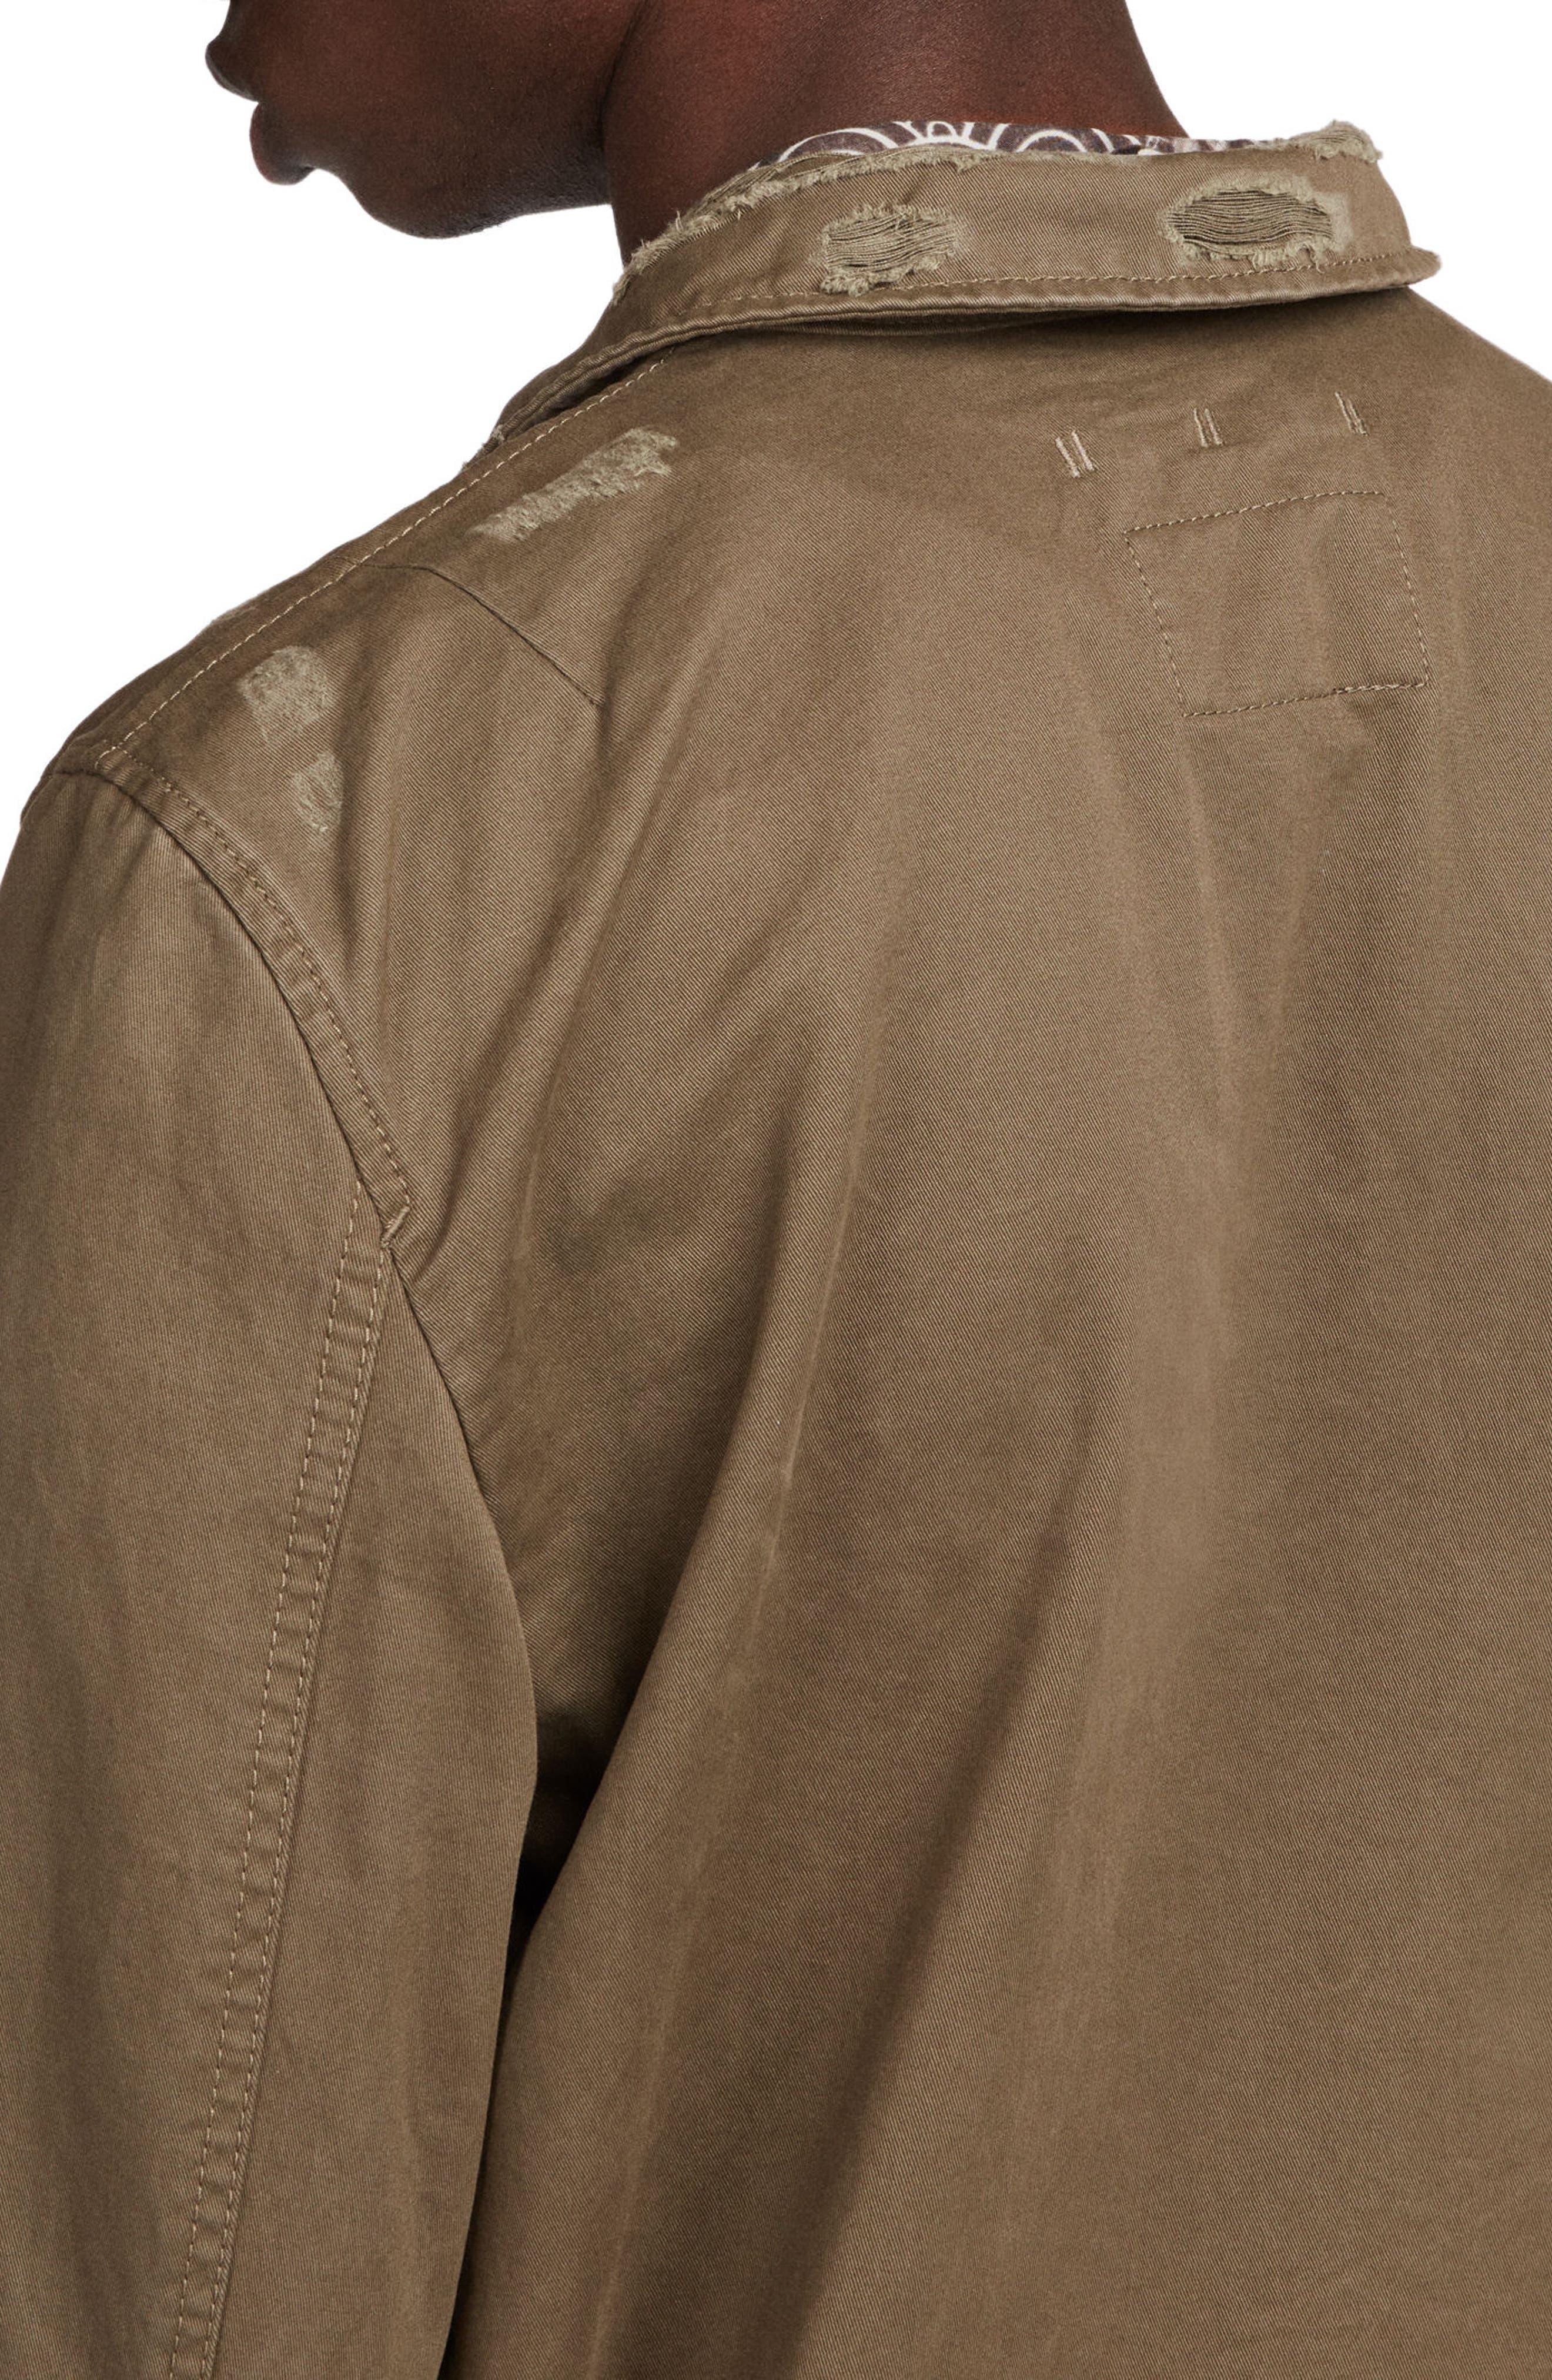 Sasaki Shirt Jacket,                             Alternate thumbnail 5, color,                             344